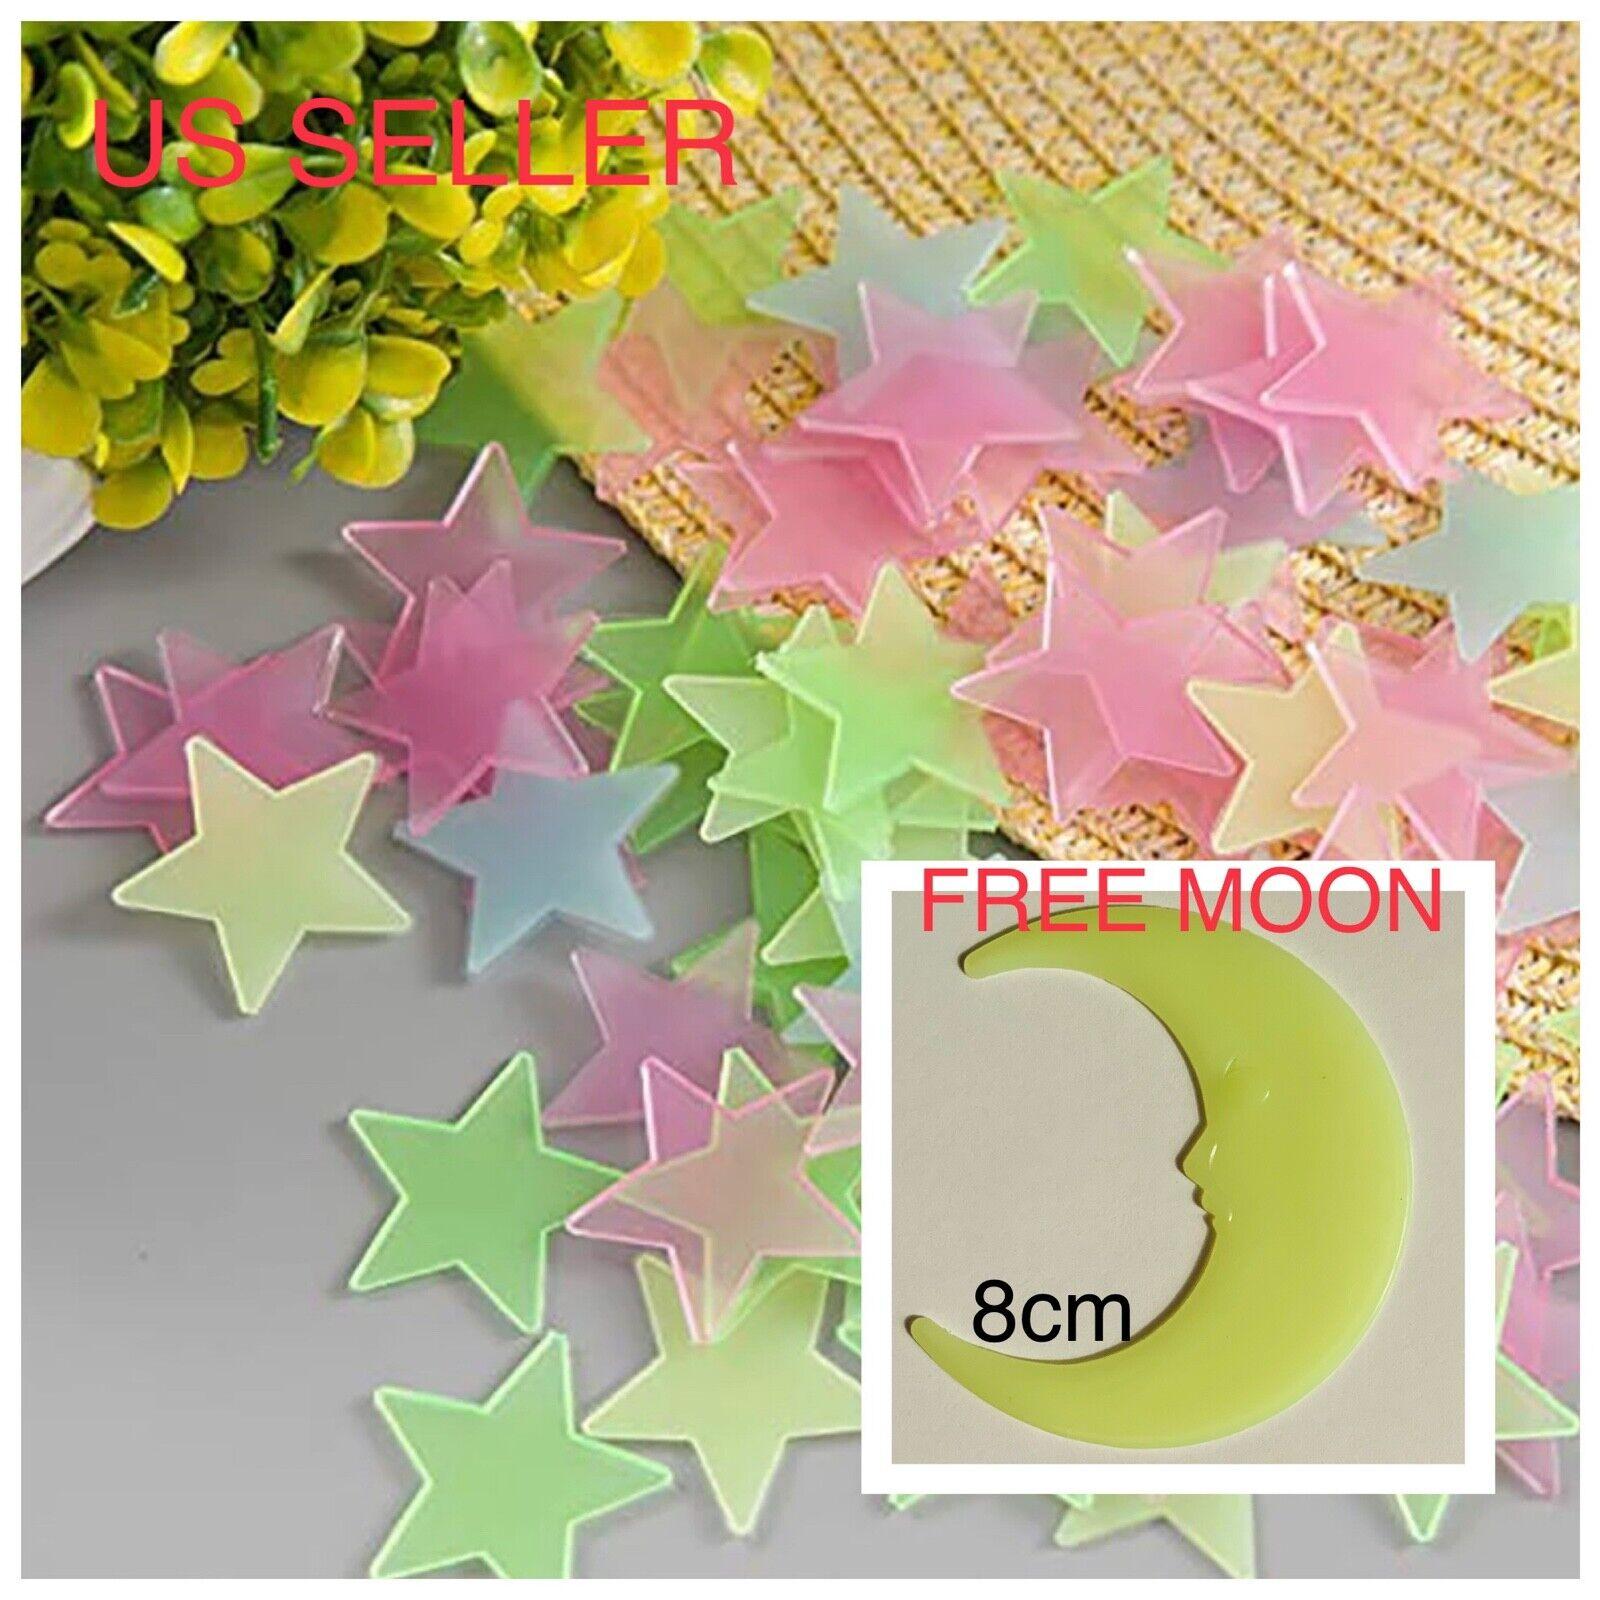 40-200Pc Stars Glow In The Dark Stickers Wall Decal Kids Bedroom *FREE 🌙 MOON